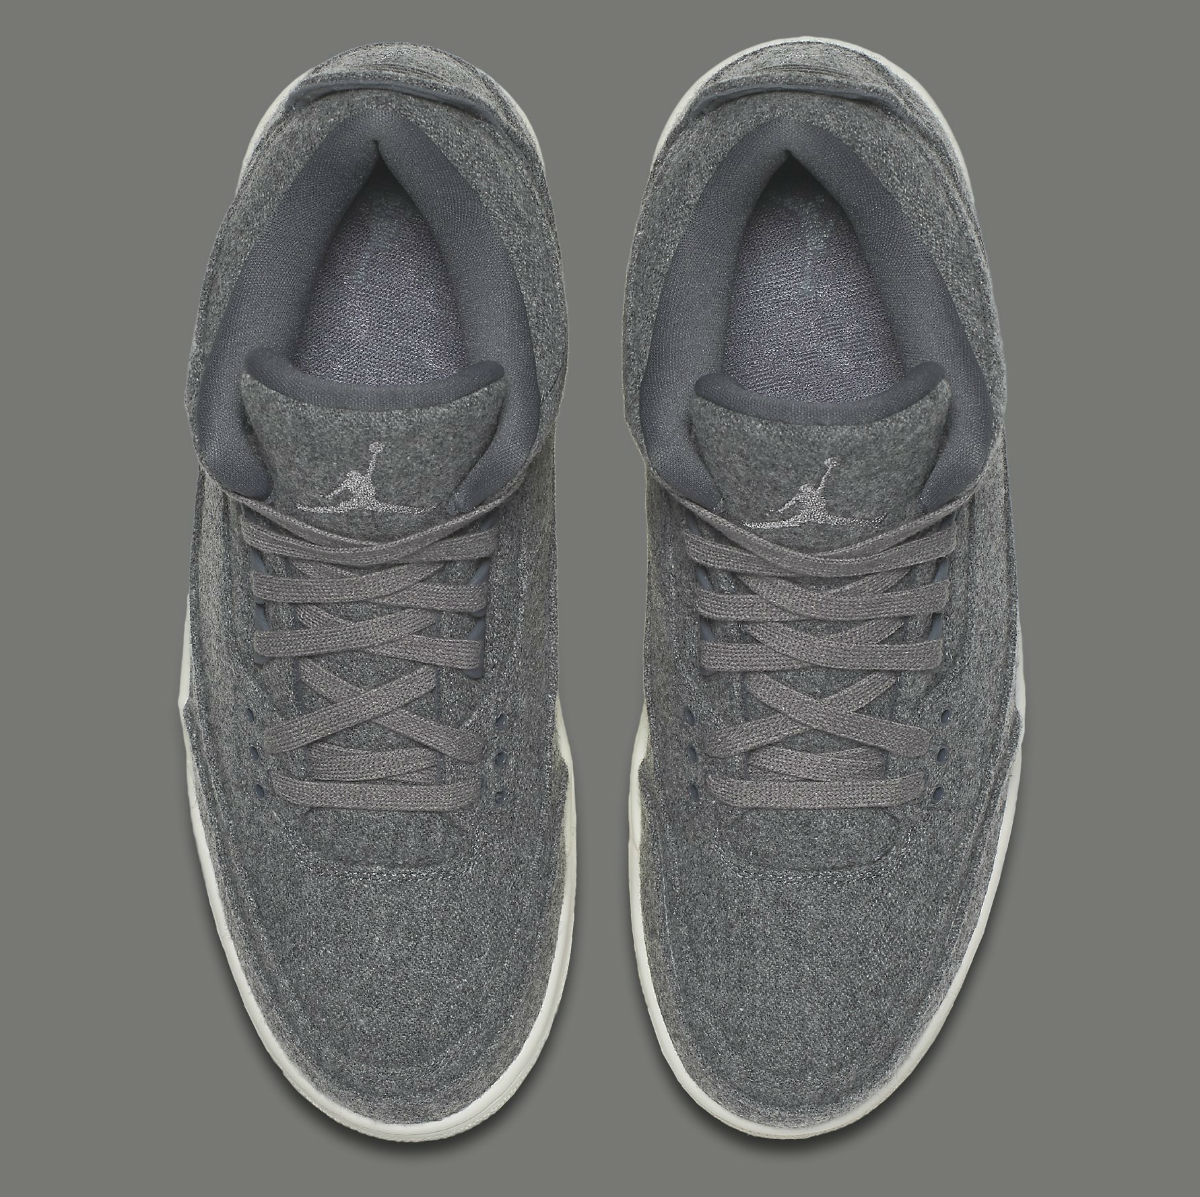 Air Jordan 3 Wool Release Date Top 854263-004